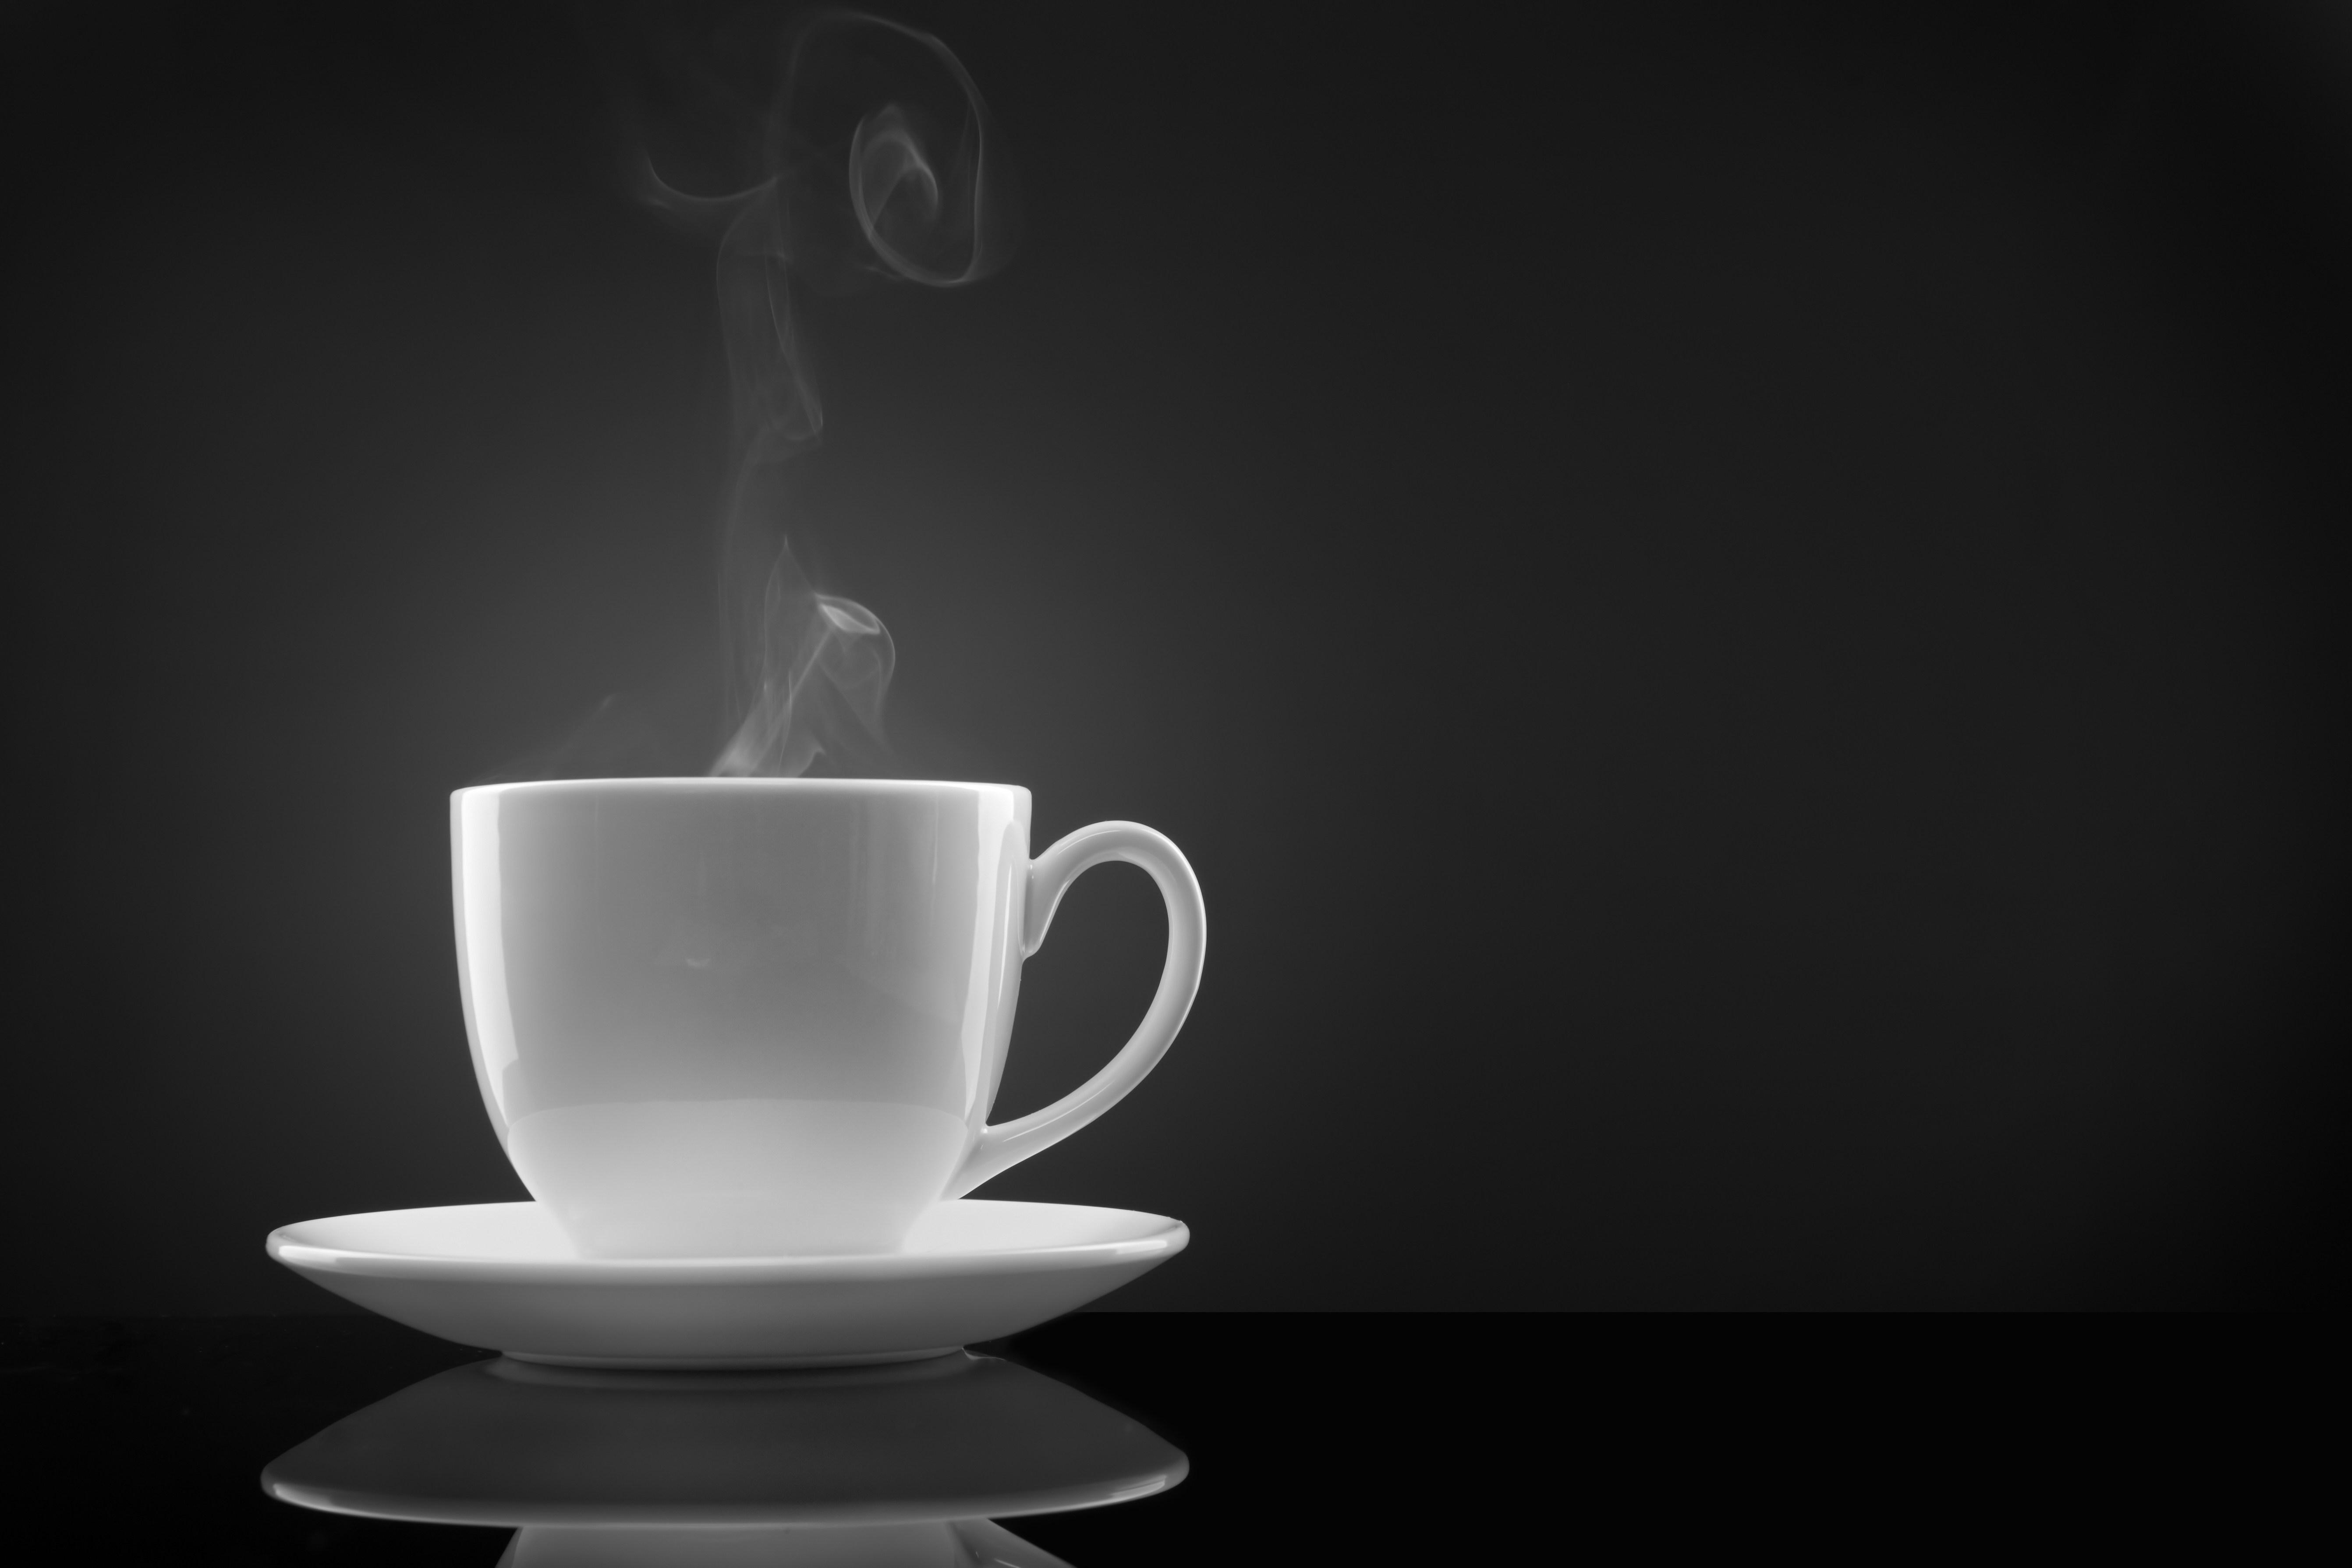 hot coffee white background - photo #43